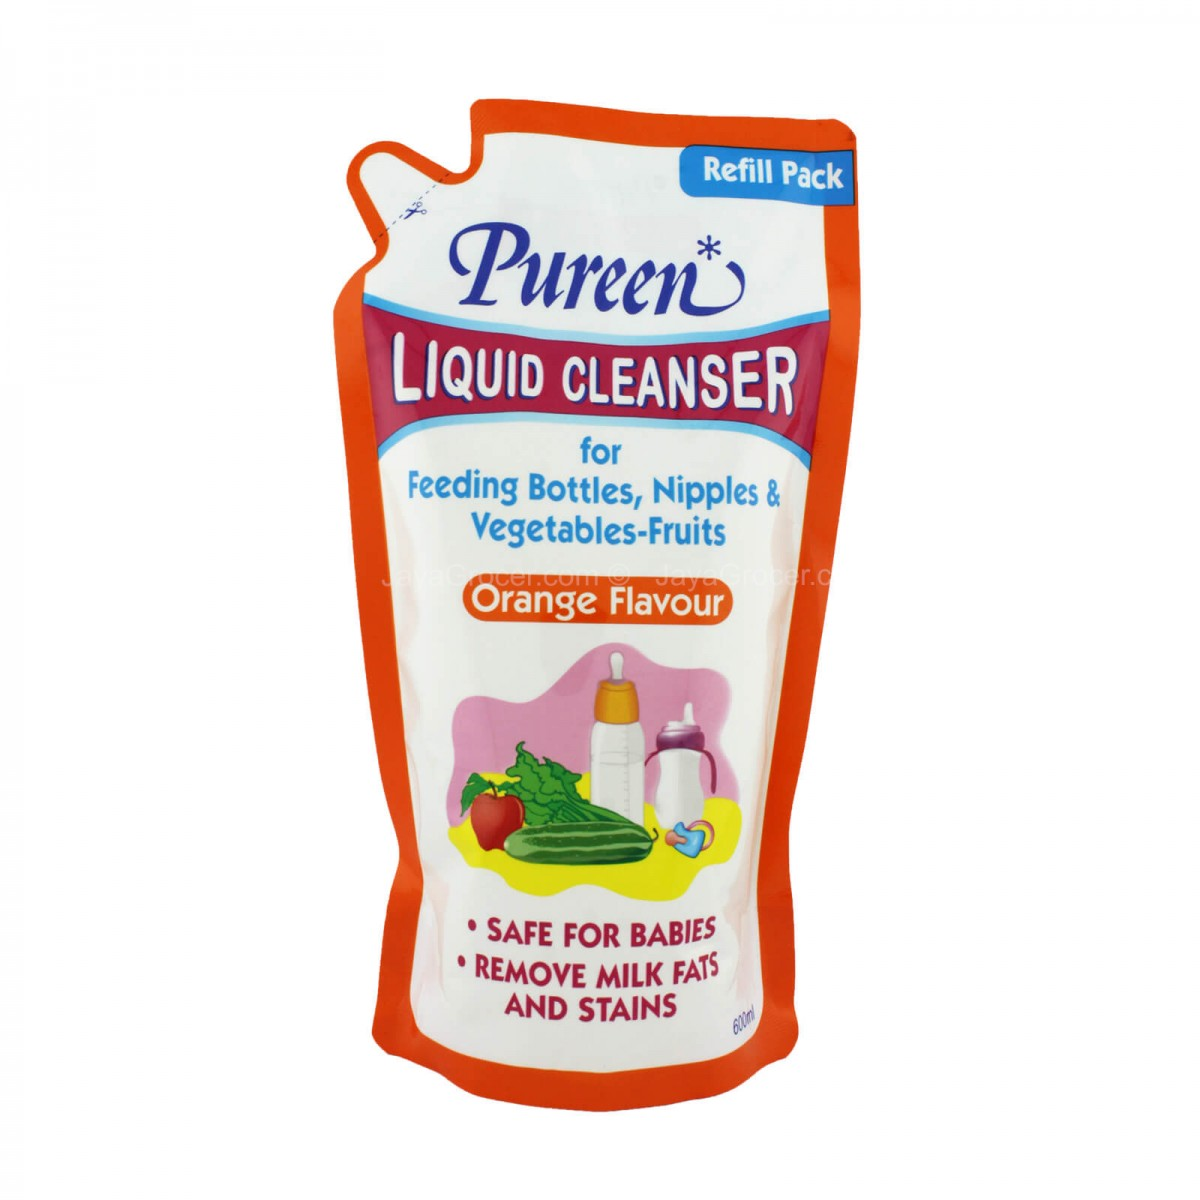 Pureen Liquid Cleanser Refill Orange Flavour (600ml) - Kico Baby Center